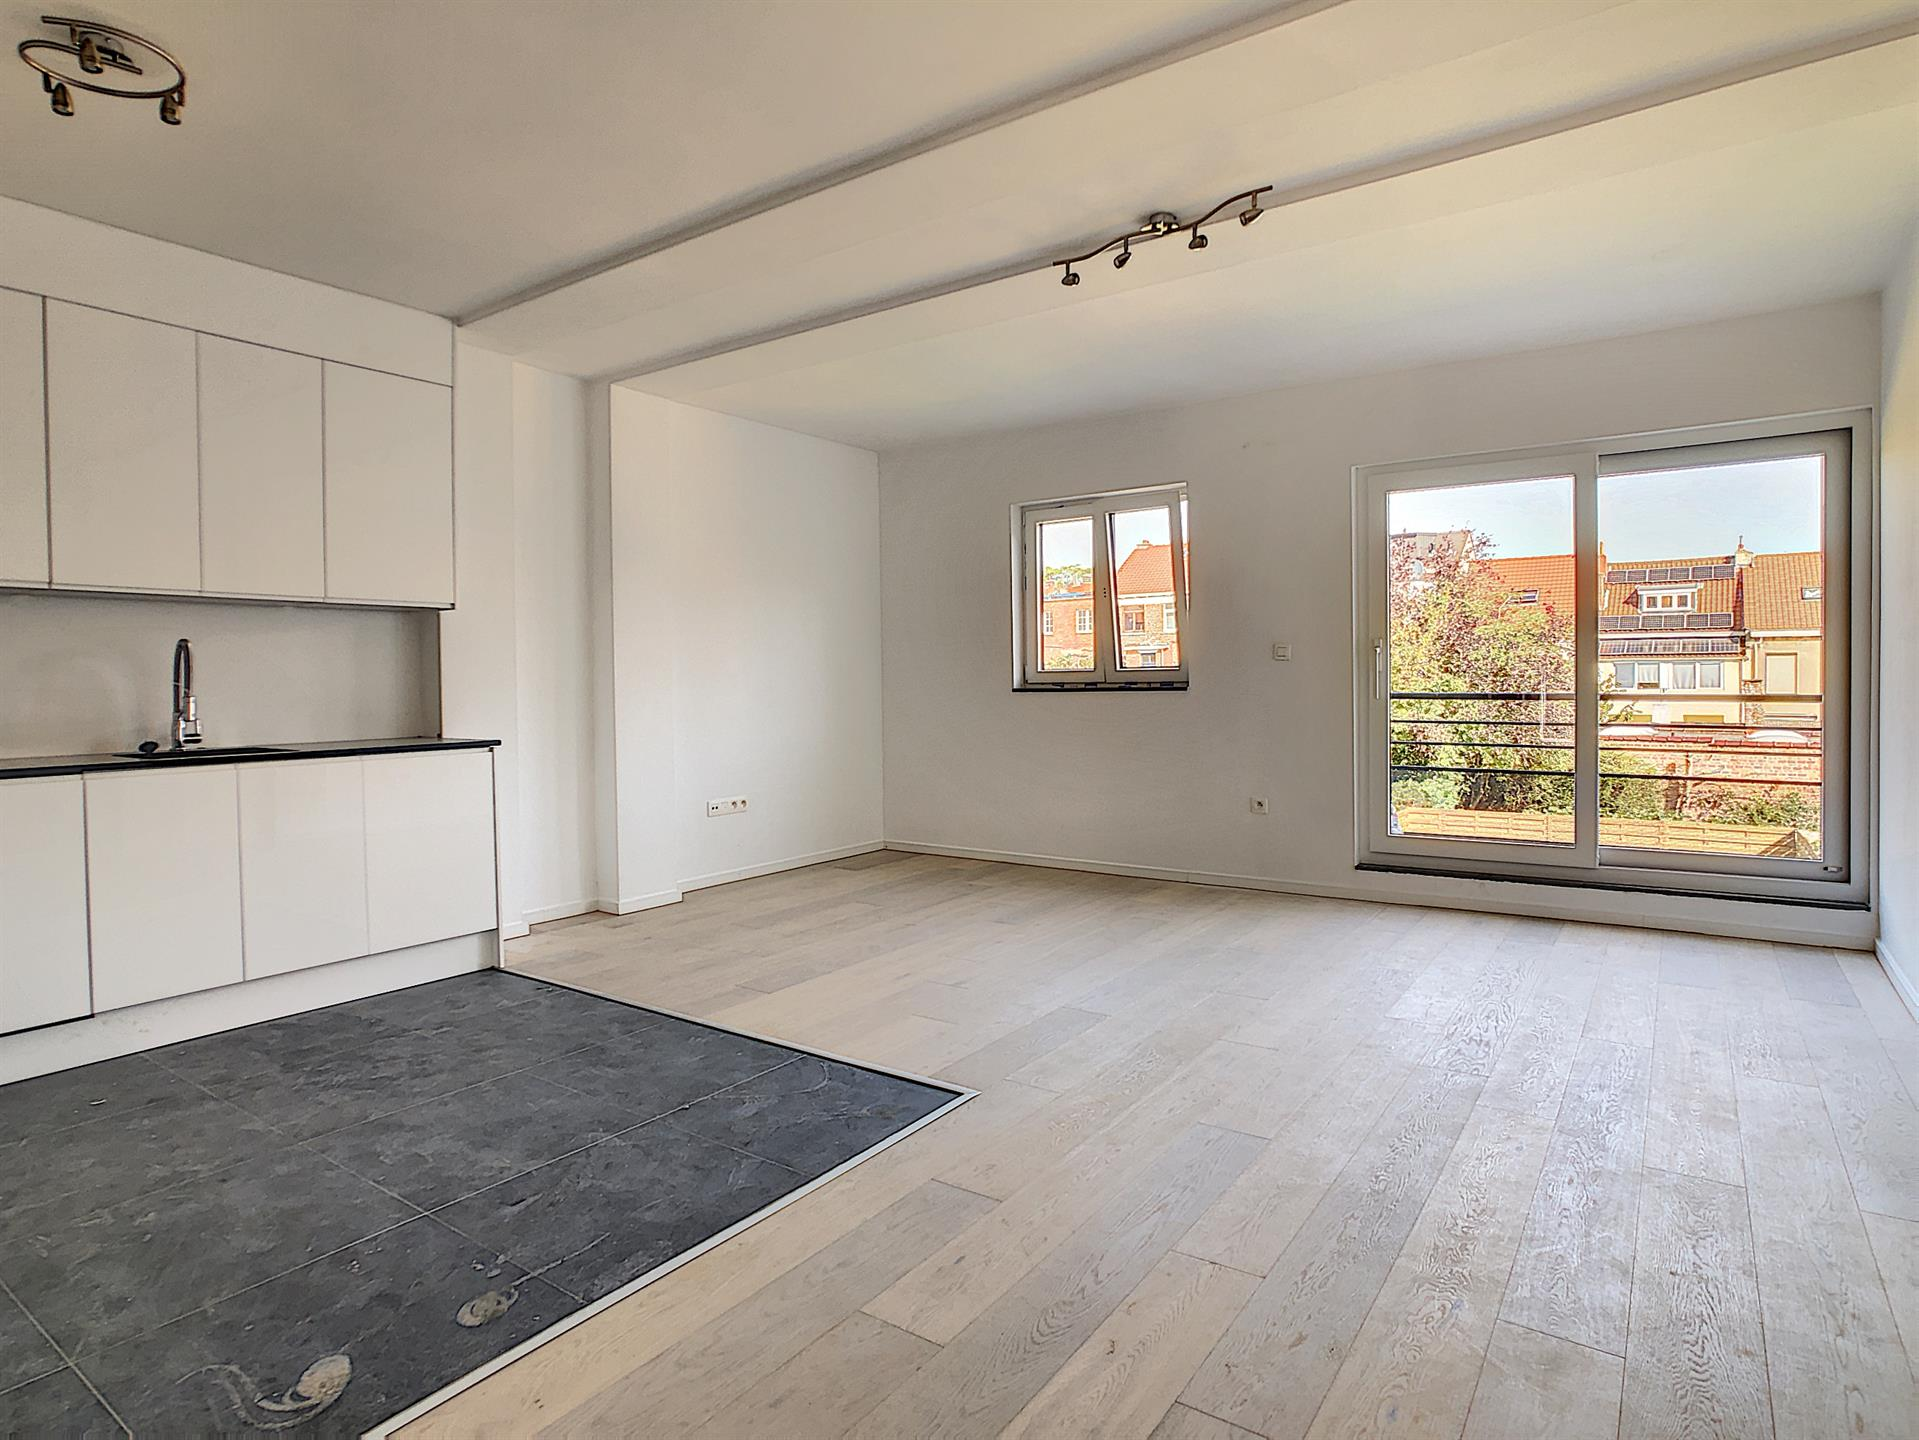 Appartement - Anderlecht - #4252377-13